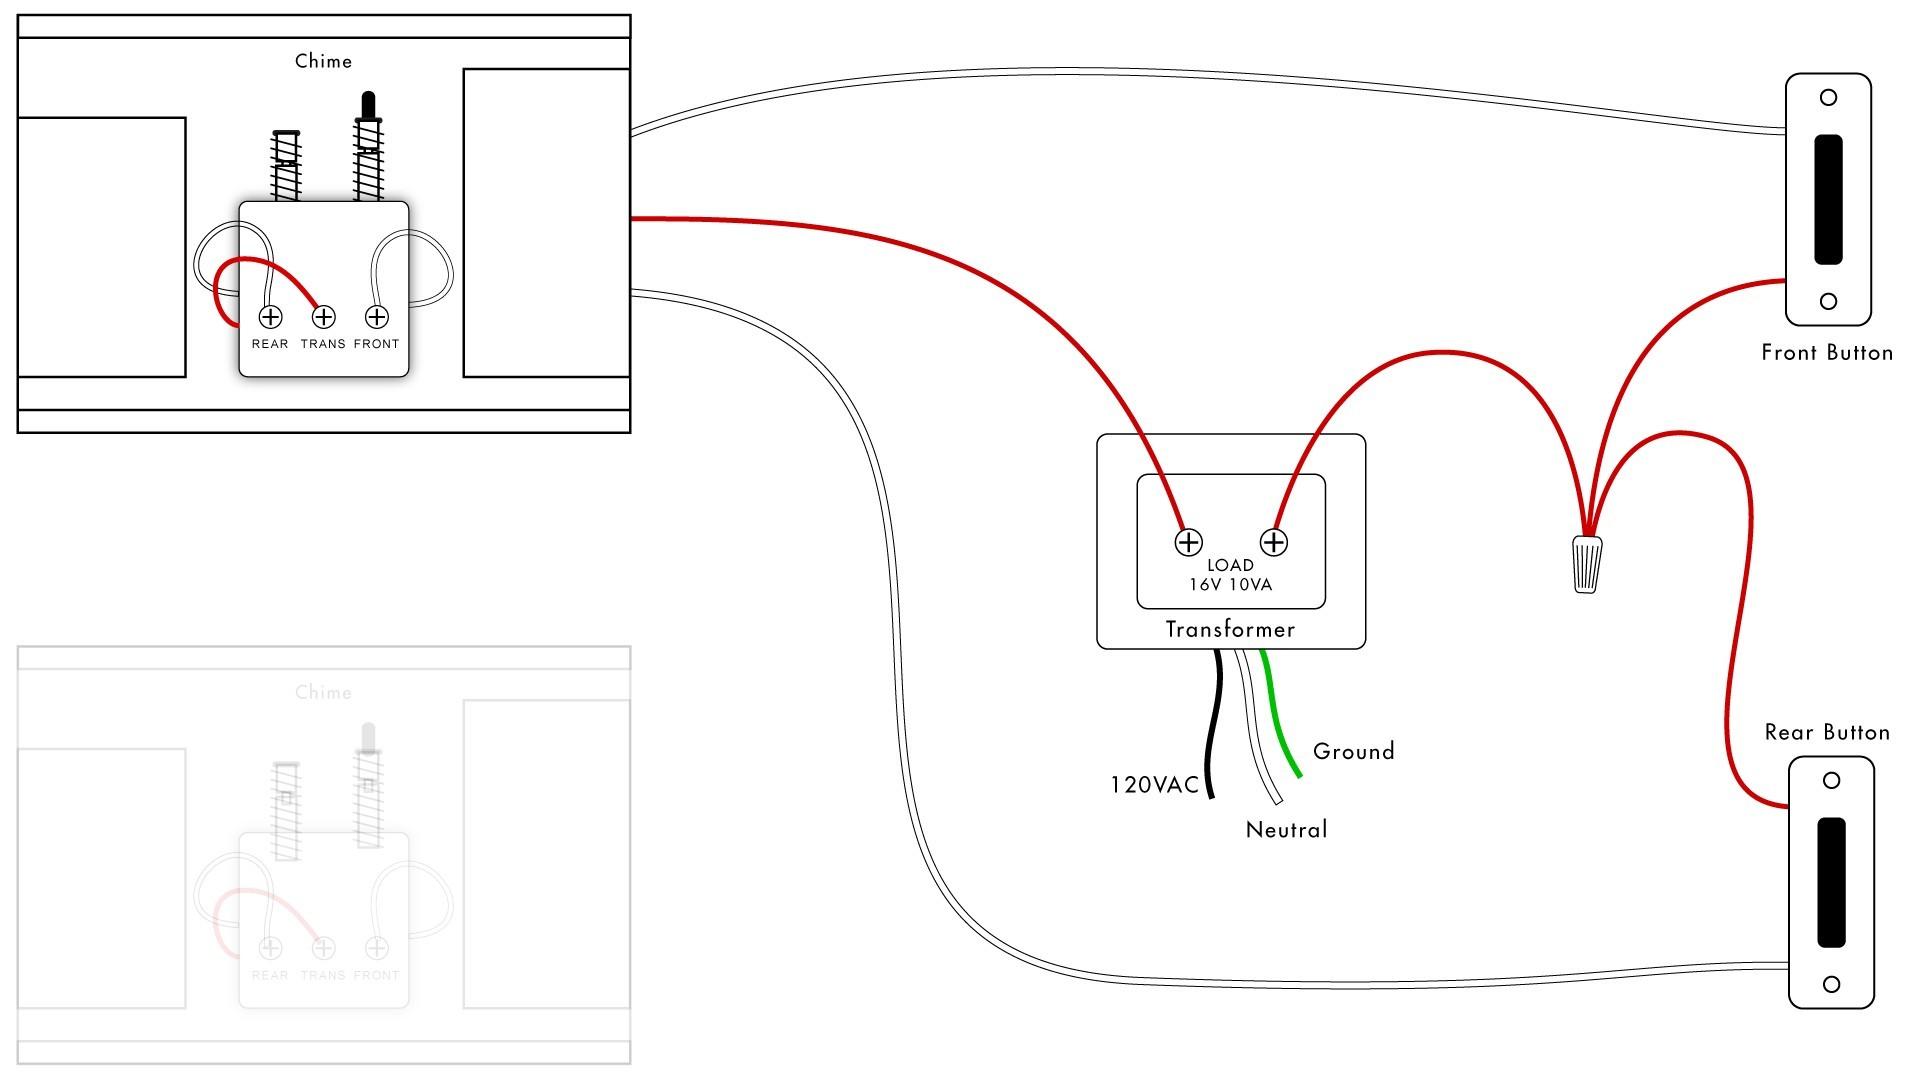 Simple Wiring Diagram For House Save Doorbell Diagrams Diy Best Transformer